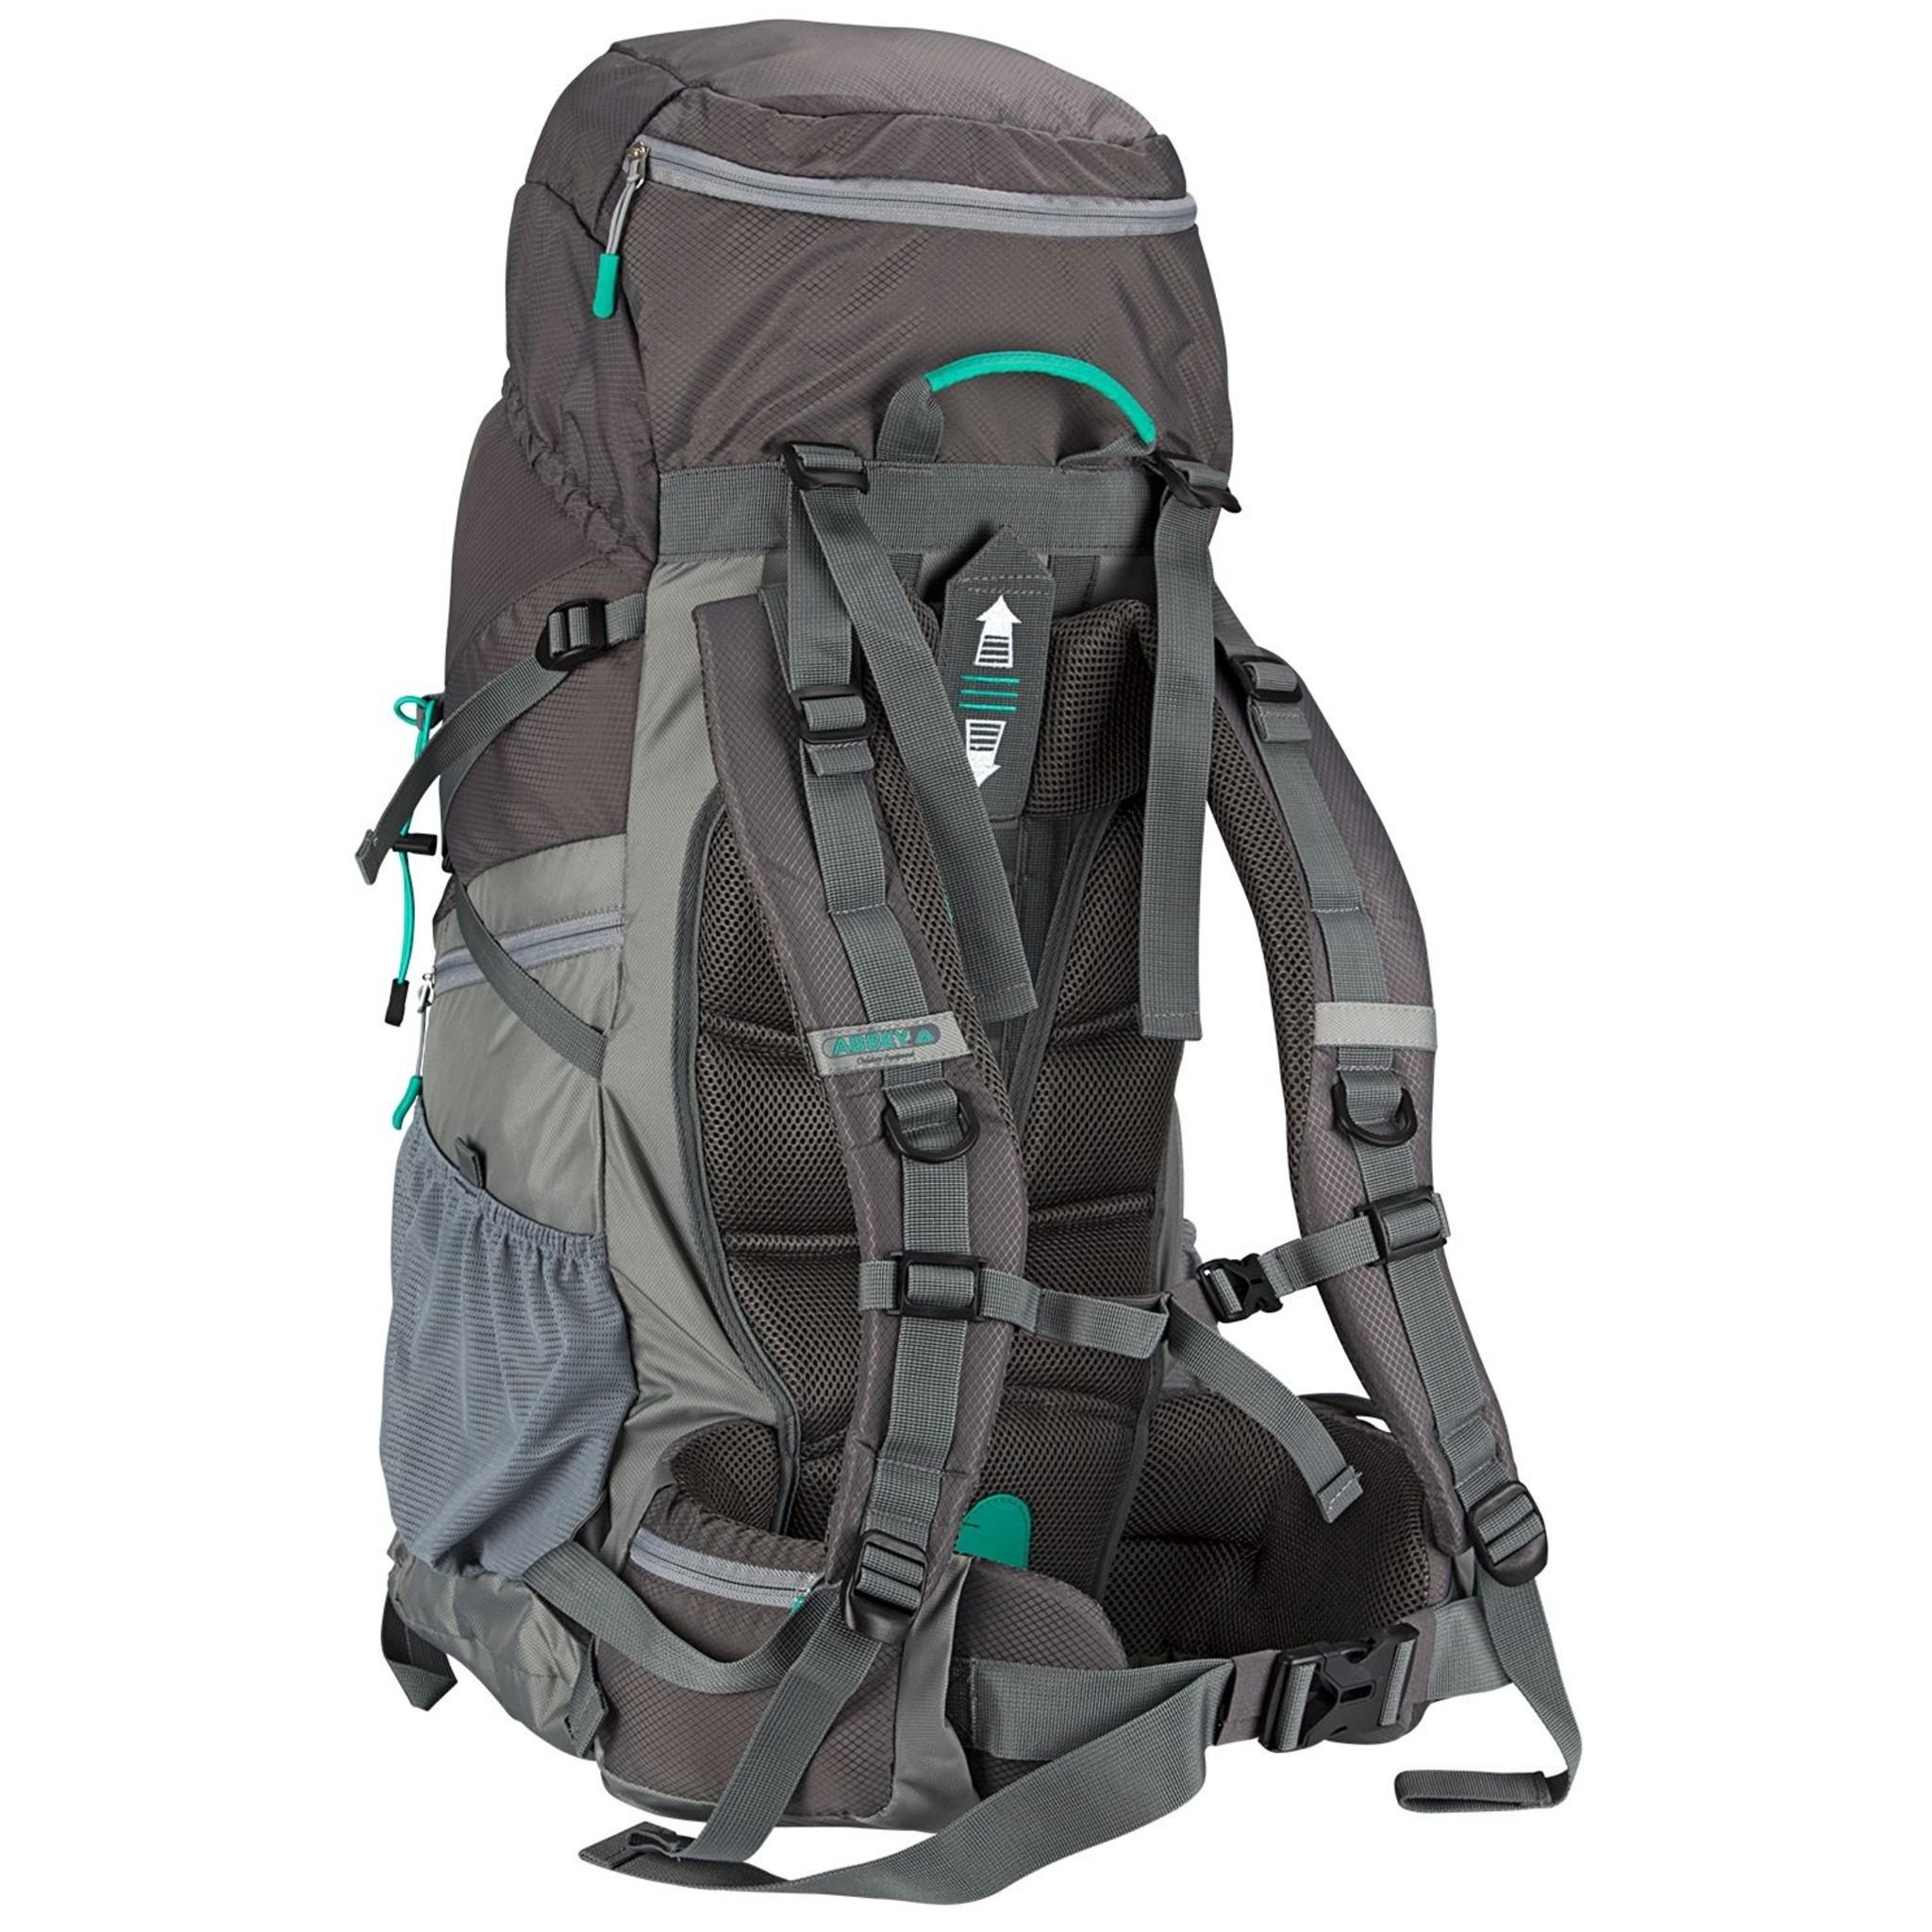 Abbey® Rugzak Trekking Sphere - 60L - met Verstelsysteem